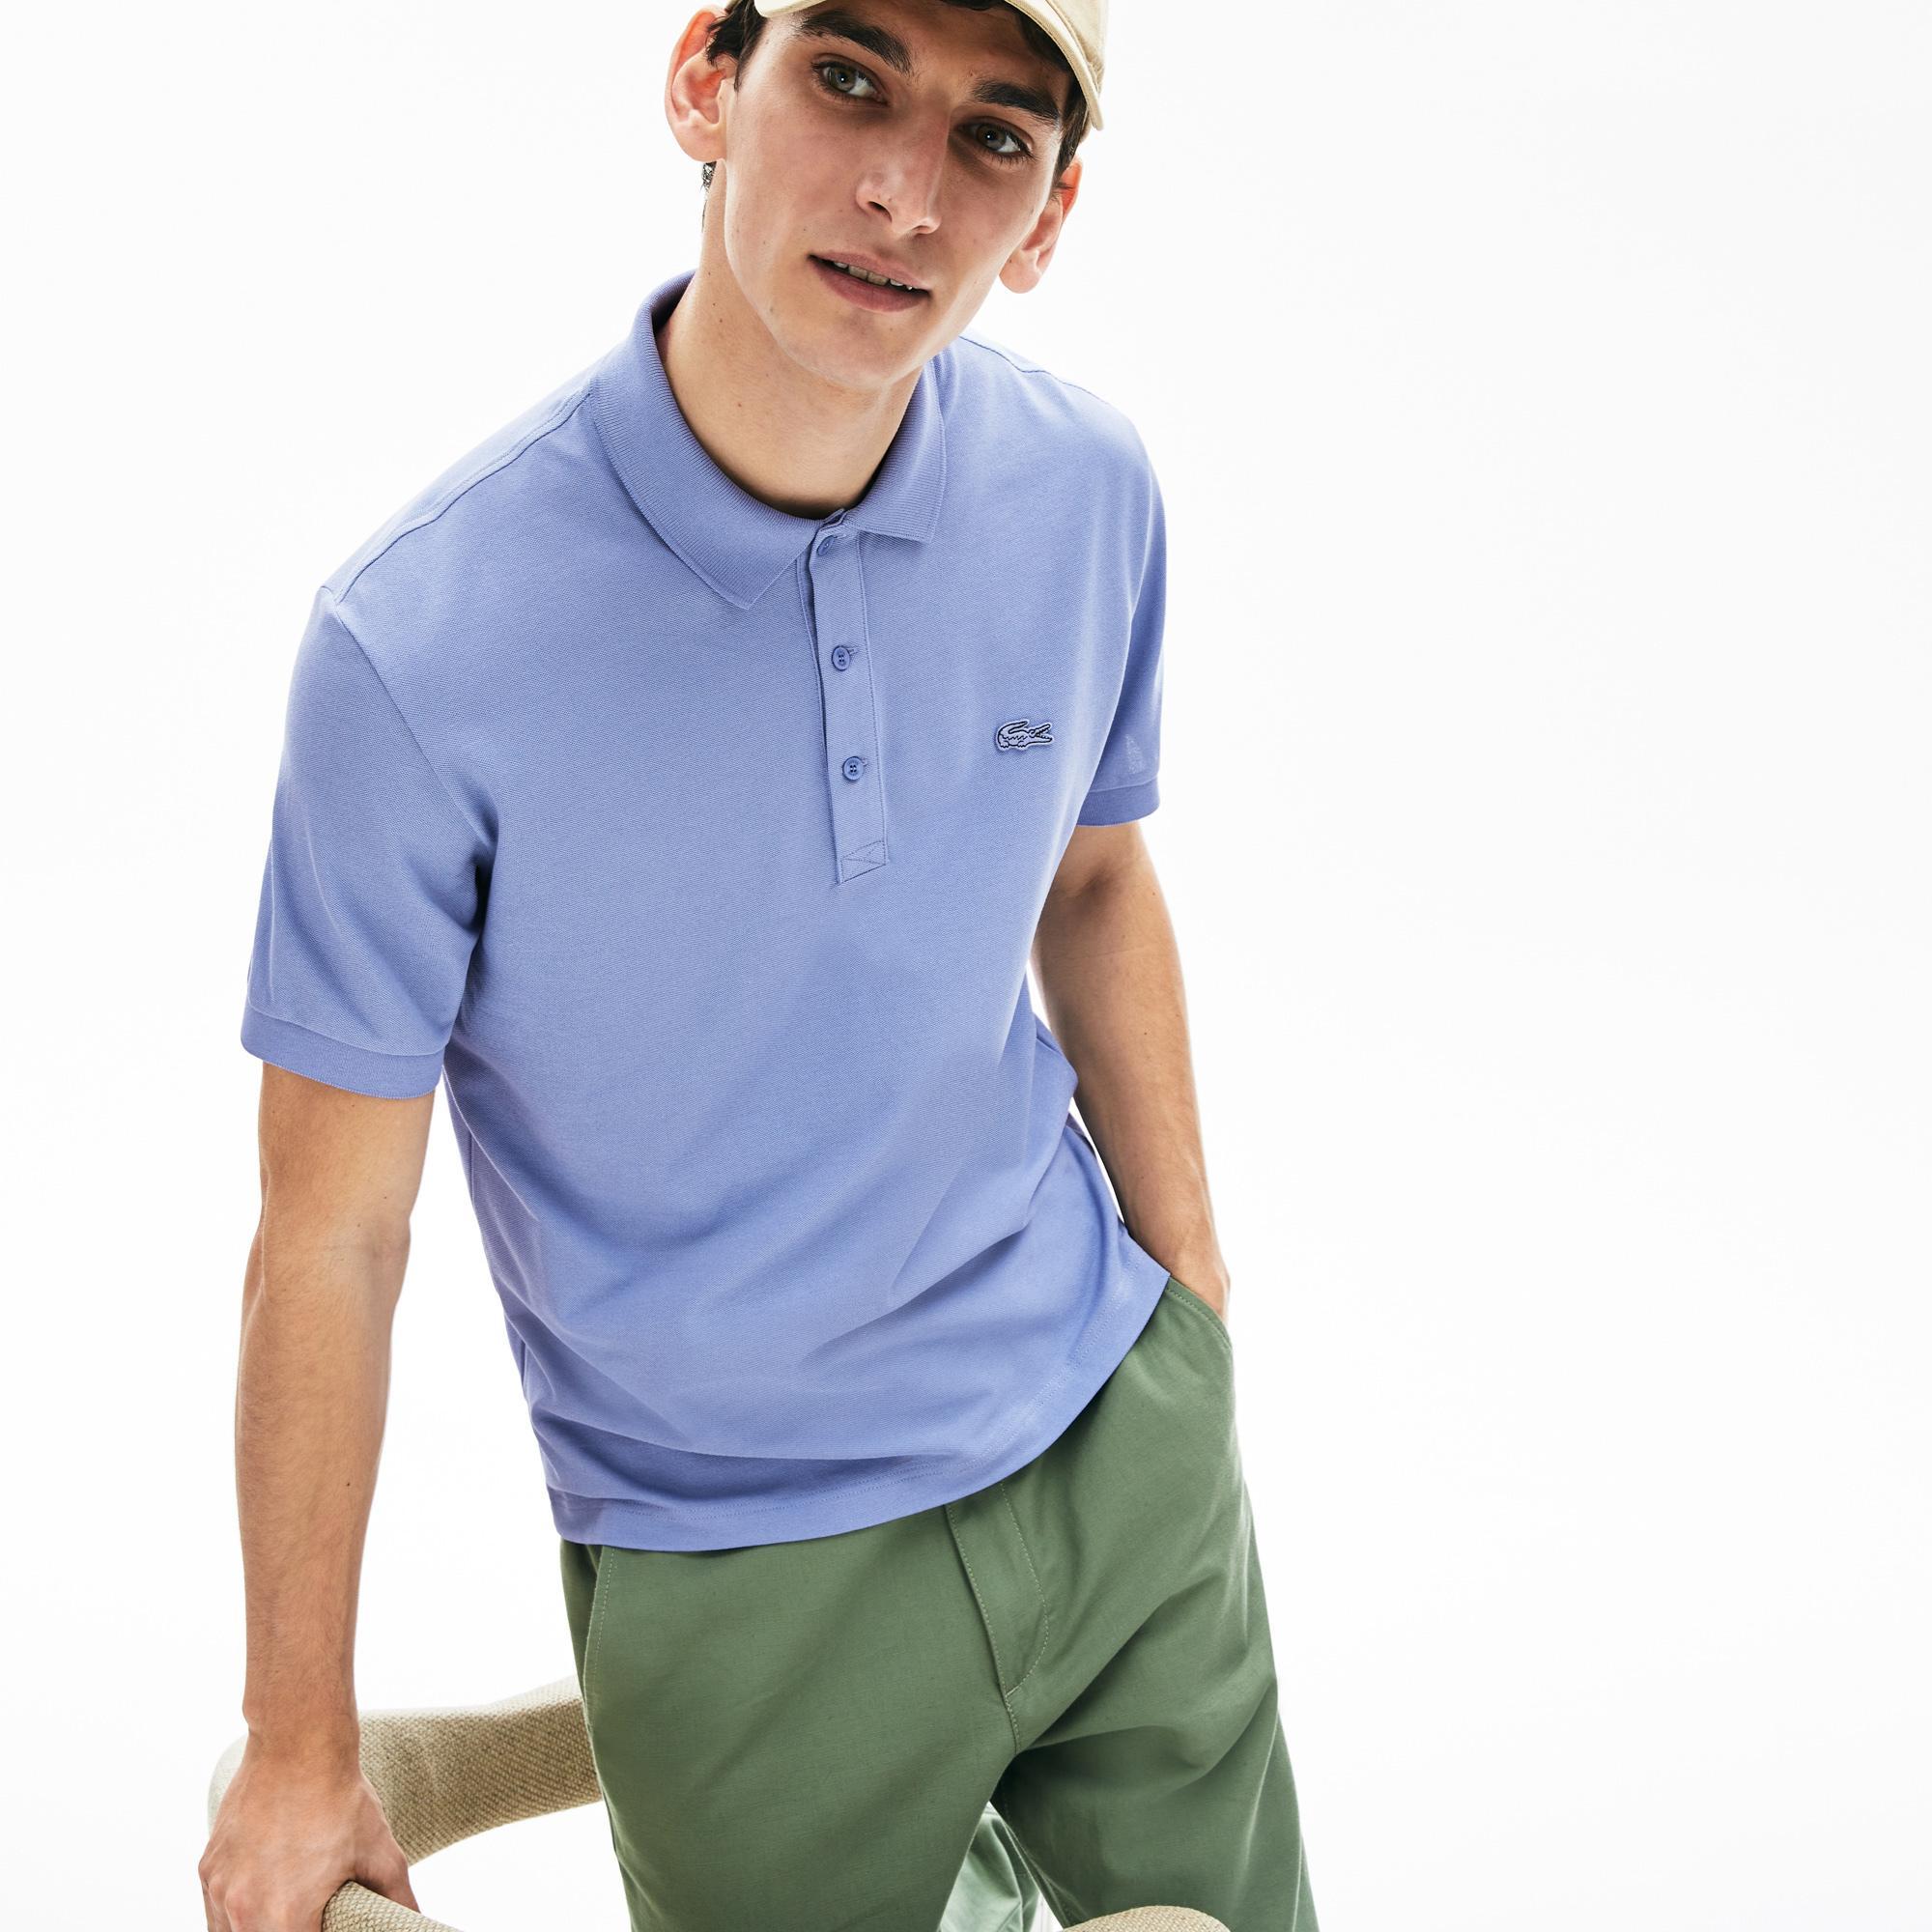 Lacoste Men's Classic Fit Polo